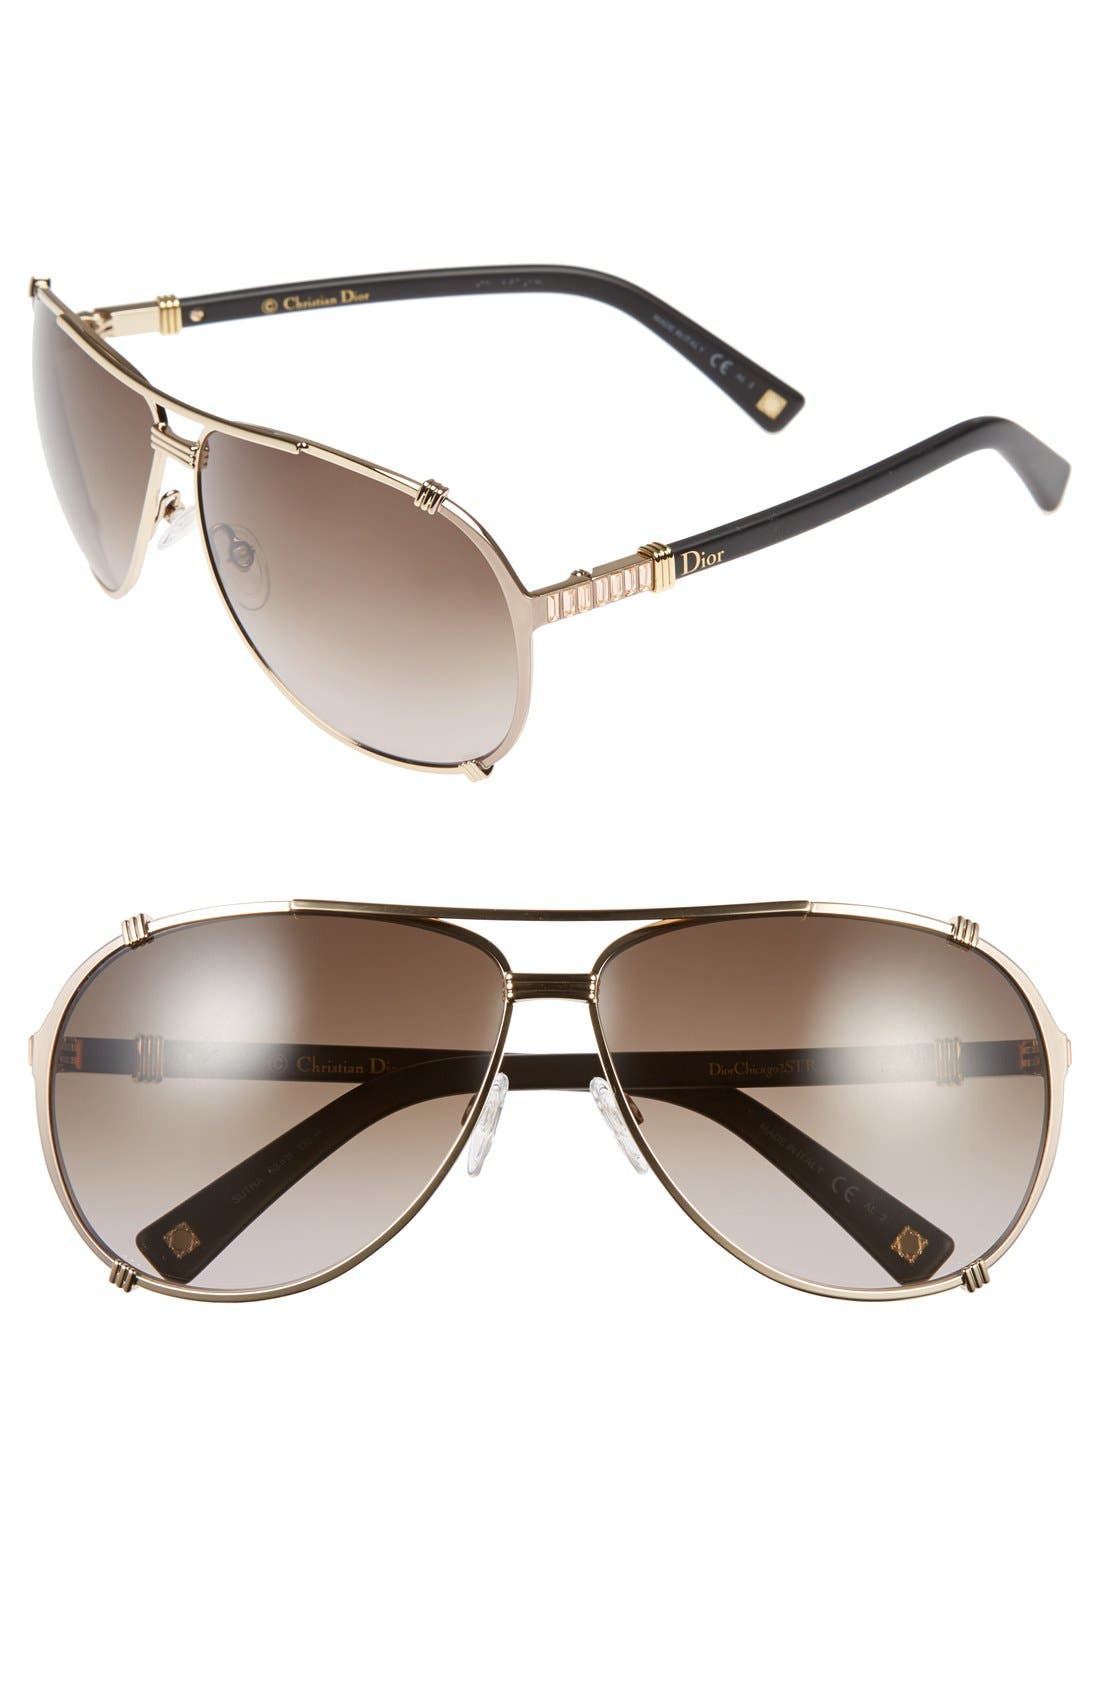 Main Image - Dior 'Chicago 2 Strass' 63mm Aviator Sunglasses